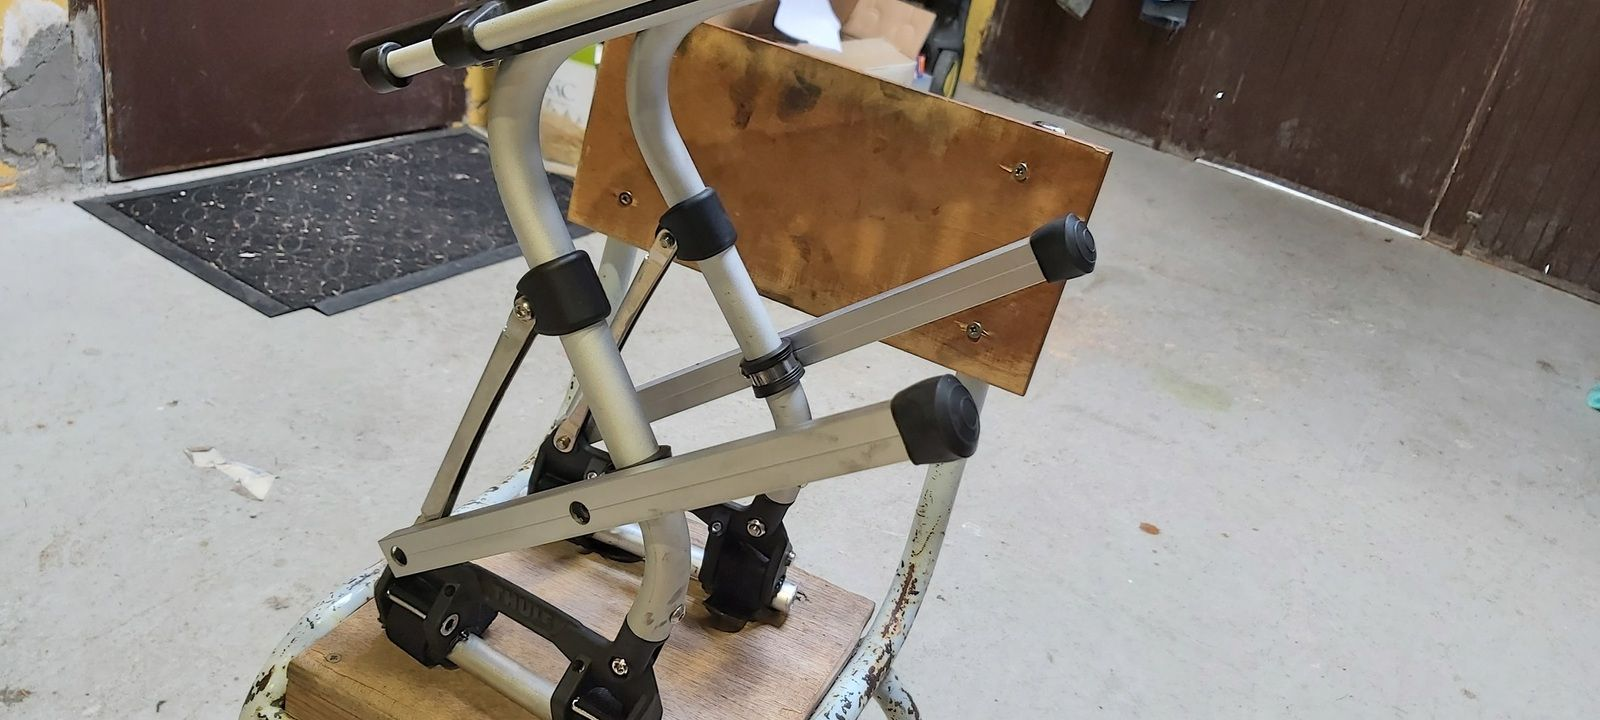 Porte bagage vélo Thule Tour Rack Pack'N Pedal